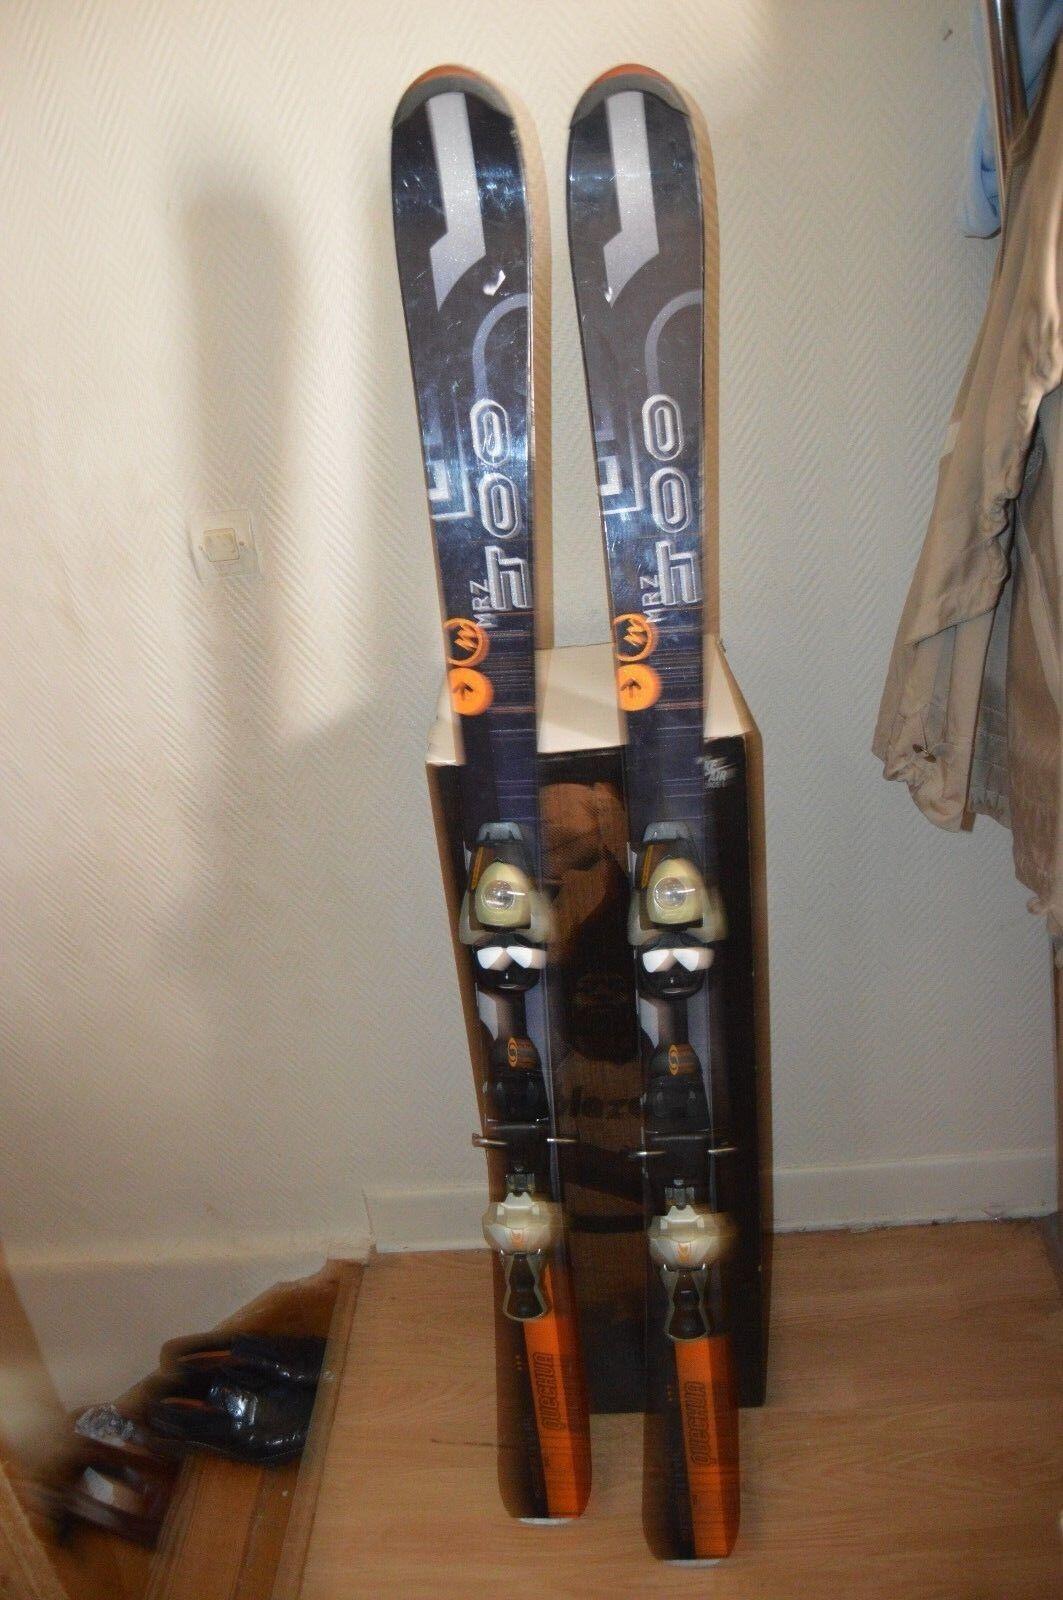 Esquí Quechua MZR 600 Tamaño 150cm + Fijación Salomon S 740 Ski   Esqui Be